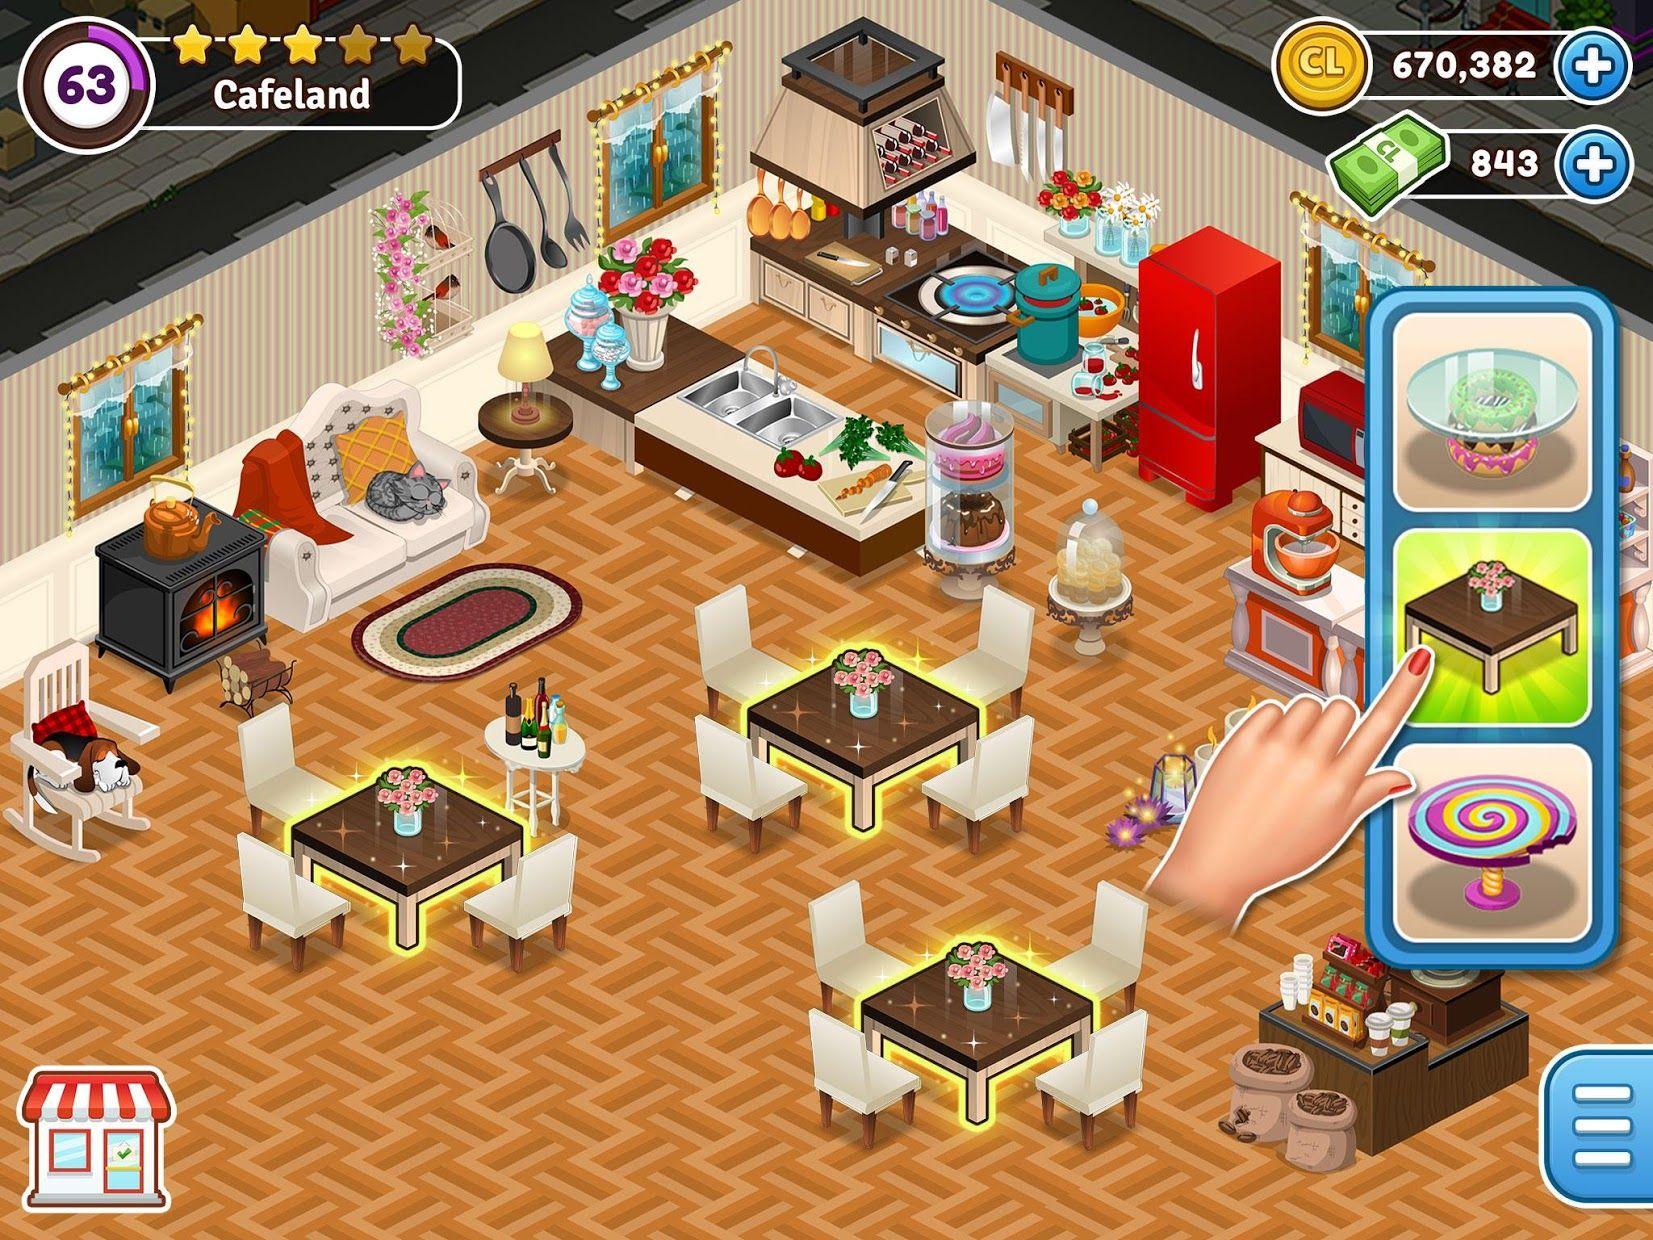 Cafeland - 餐厅游戏 游戏截图2